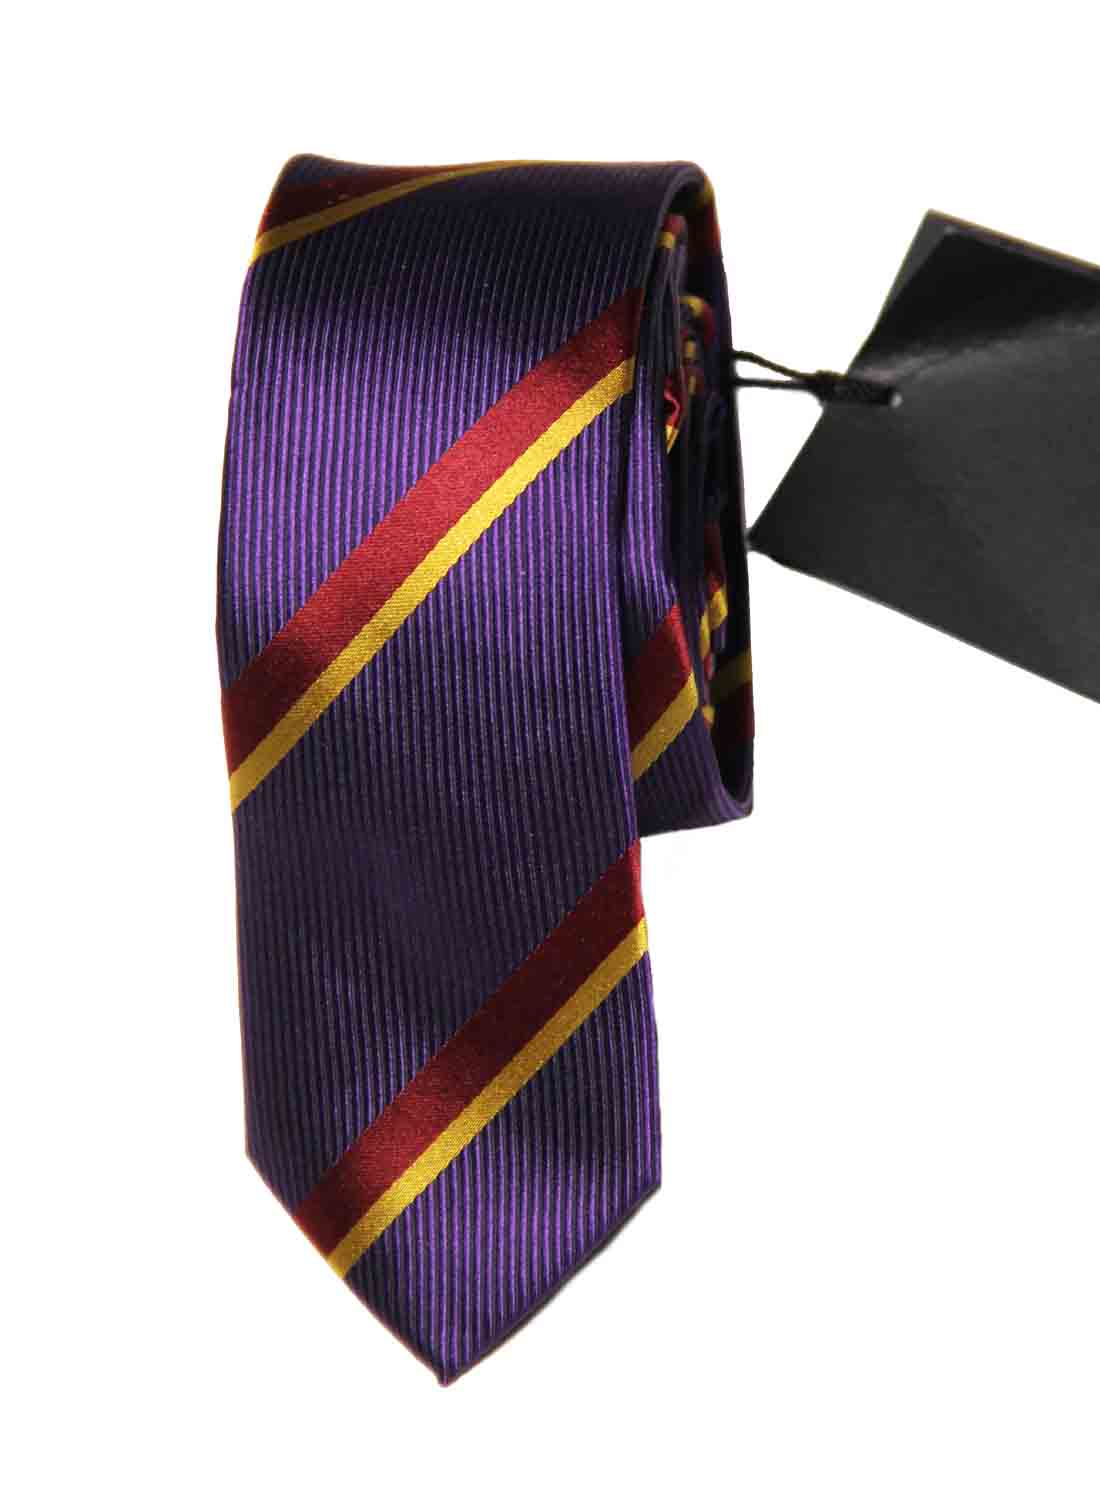 Ted Baker Silk Tie Purple Gold Red Striped Narrow Men's